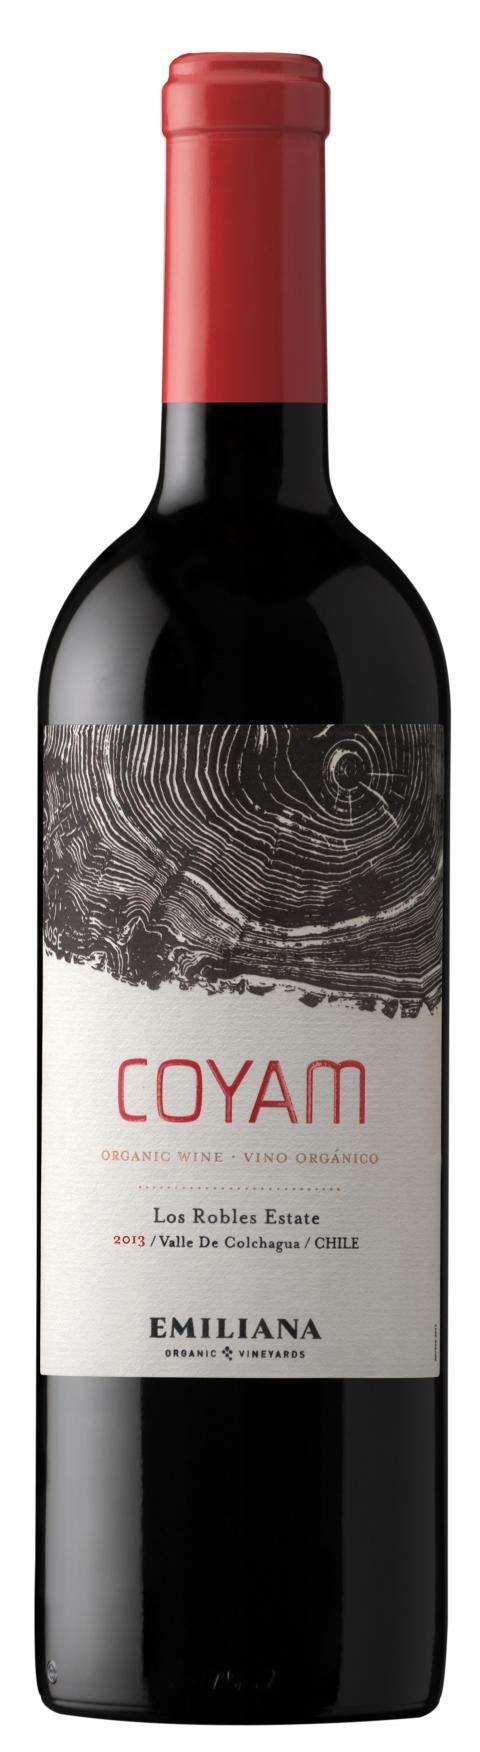 Coyam 2013